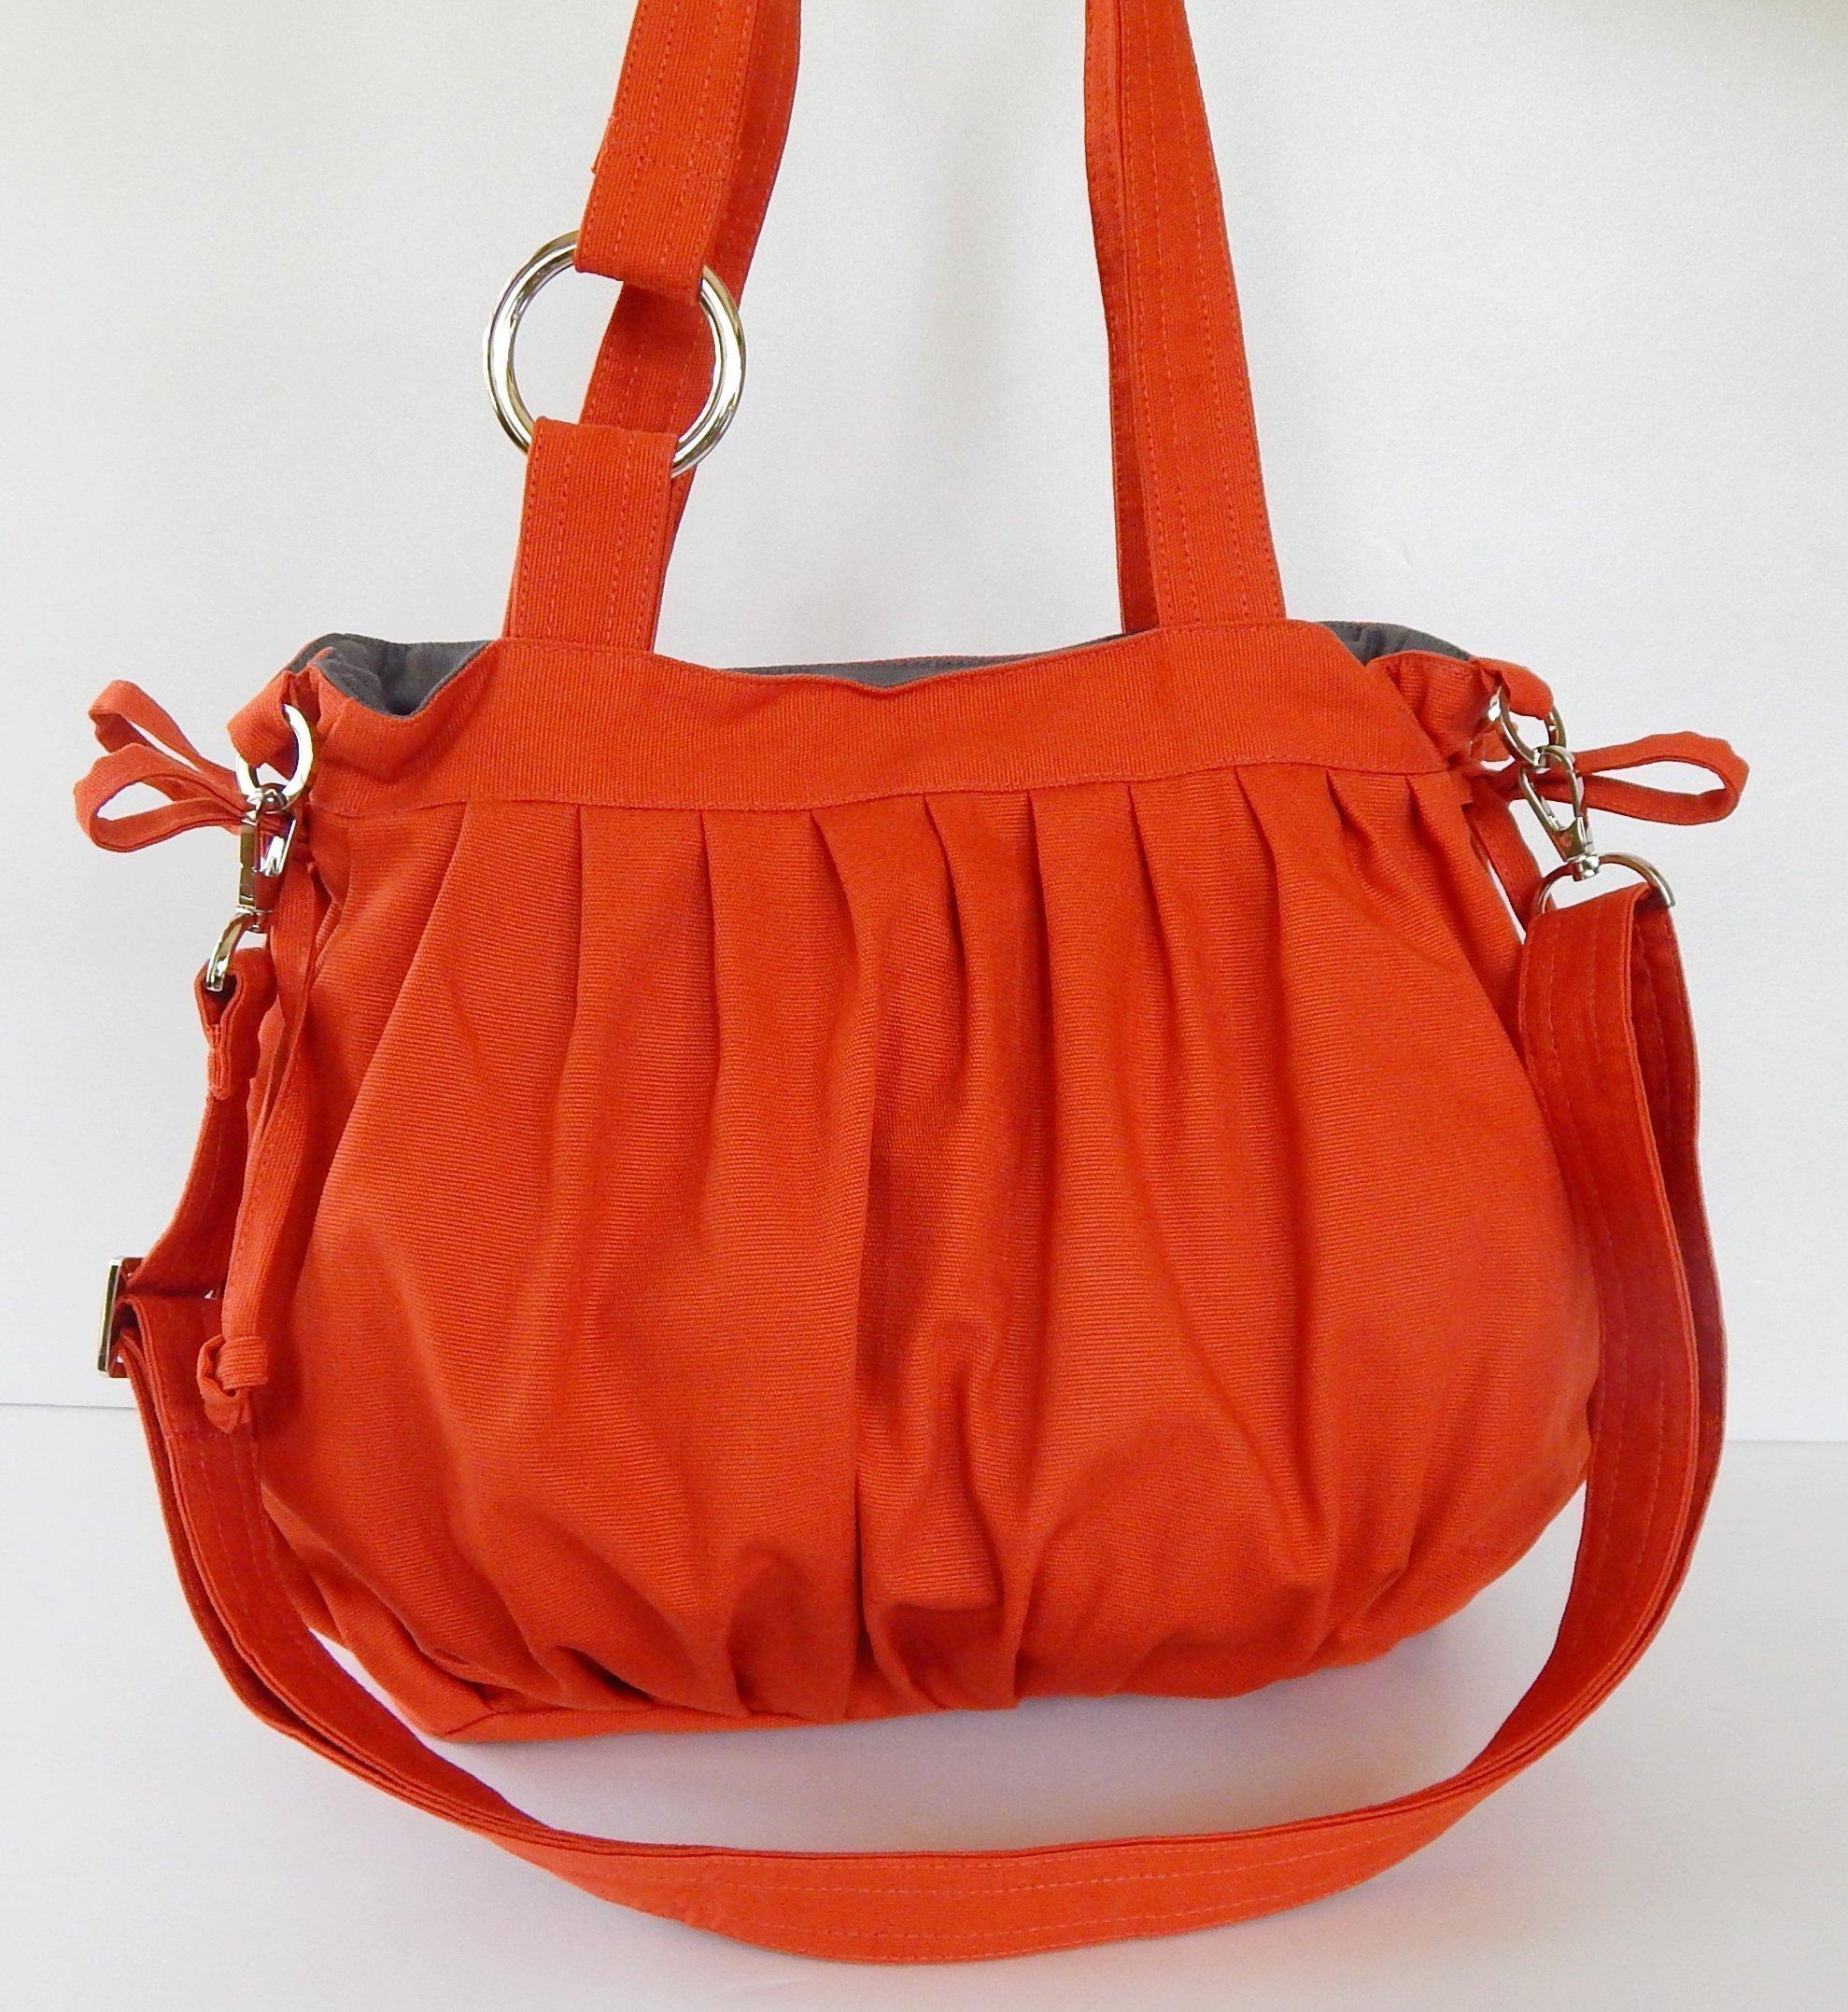 "Virine canvas pleats bag, purse, tote, shoulder bag, everyday bag, travel bag, cross body, women (11""long x 11.5""tall) burnt orange color"